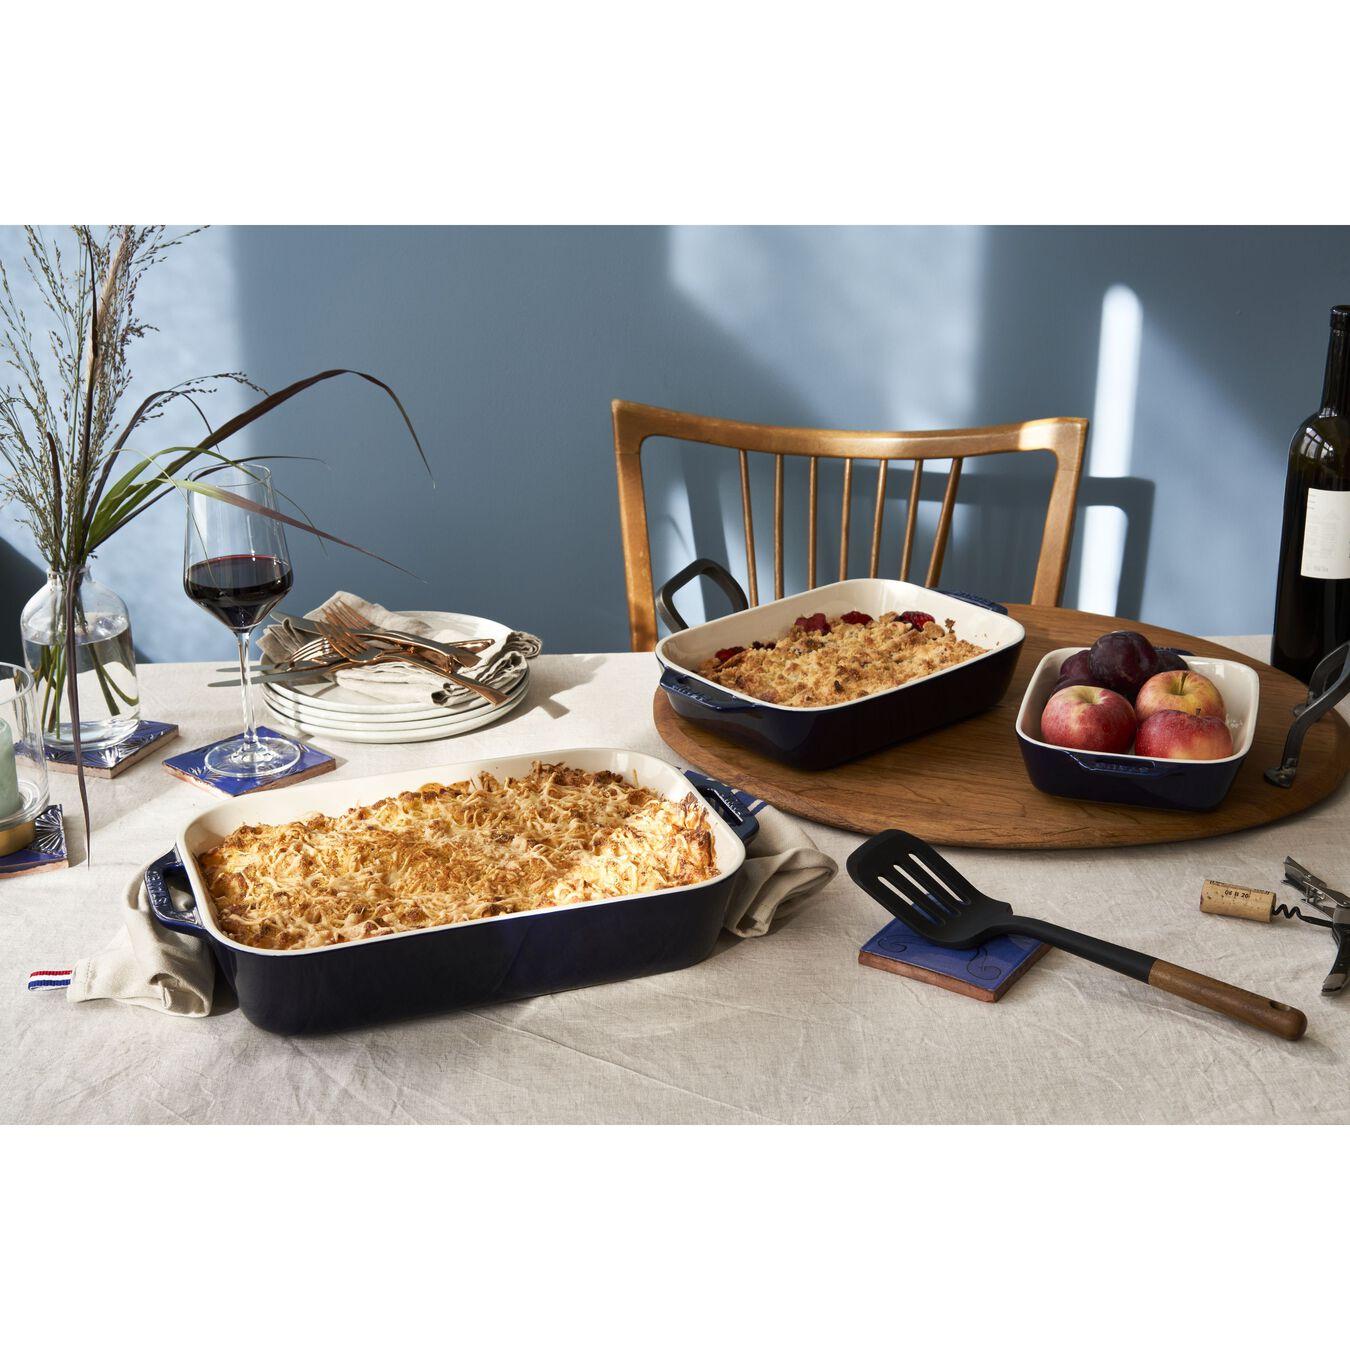 13-inch x 9-inch Rectangular Baking Dish - Dark Blue,,large 3